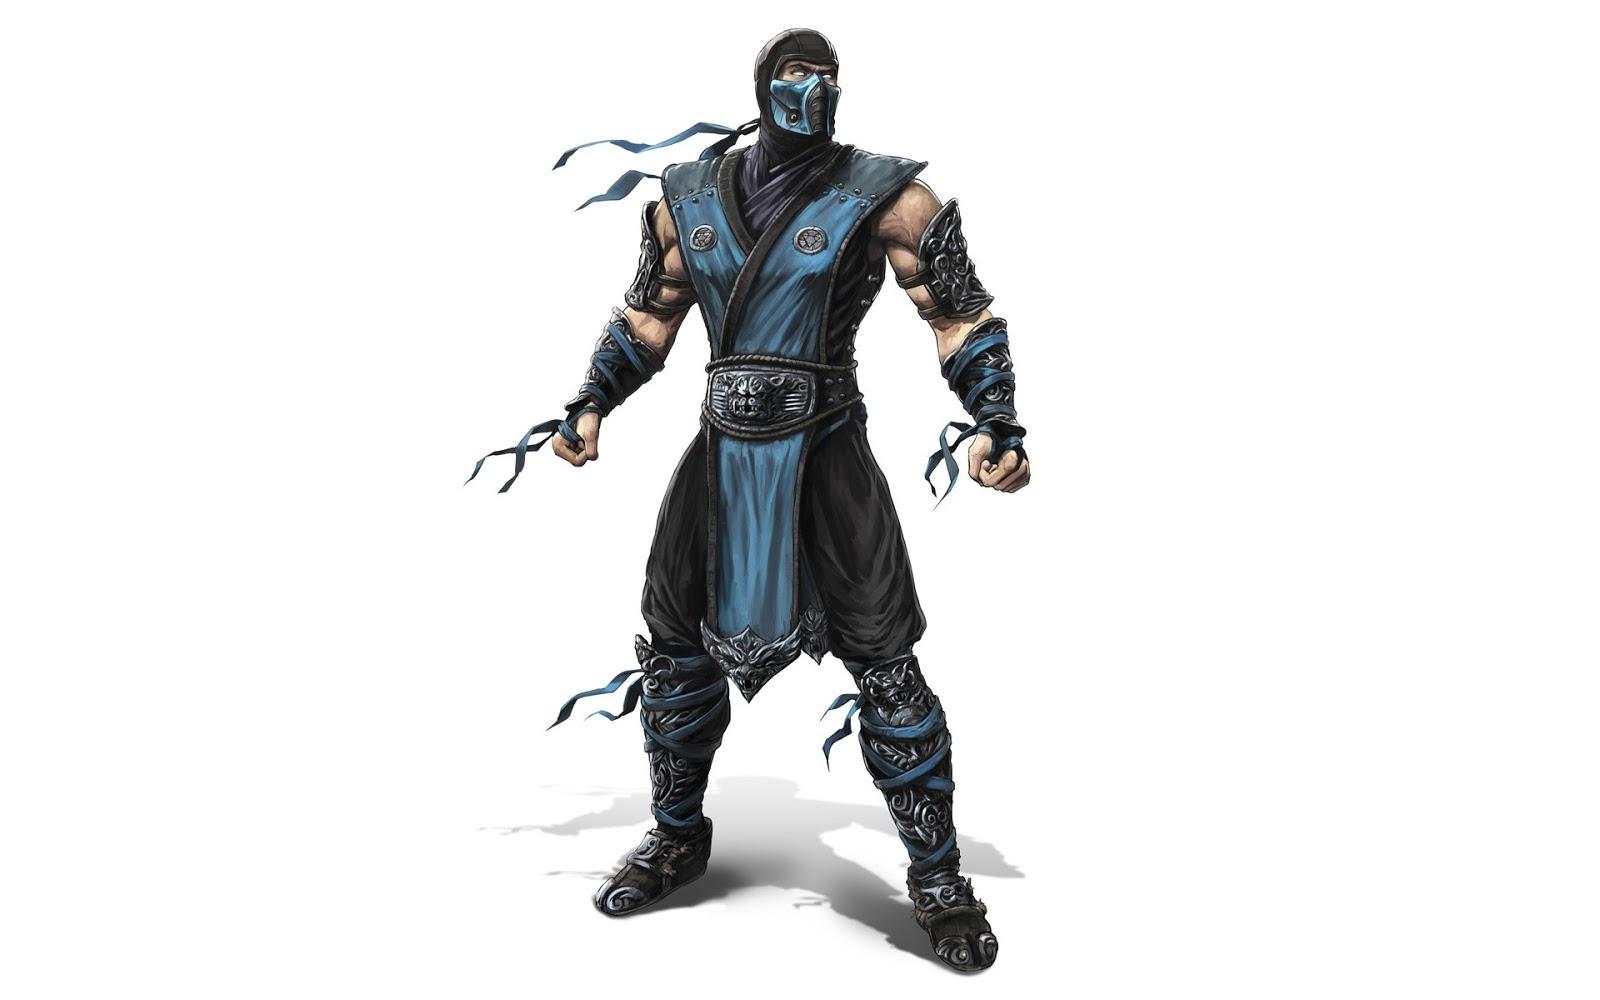 http://4.bp.blogspot.com/-ZfYyIWakUCE/Tpg0MXf-leI/AAAAAAAADdE/n4LC5zRDDTs/s1600/Sub_Zero_HD_Wallpaper_Mortal_Combat.jpg